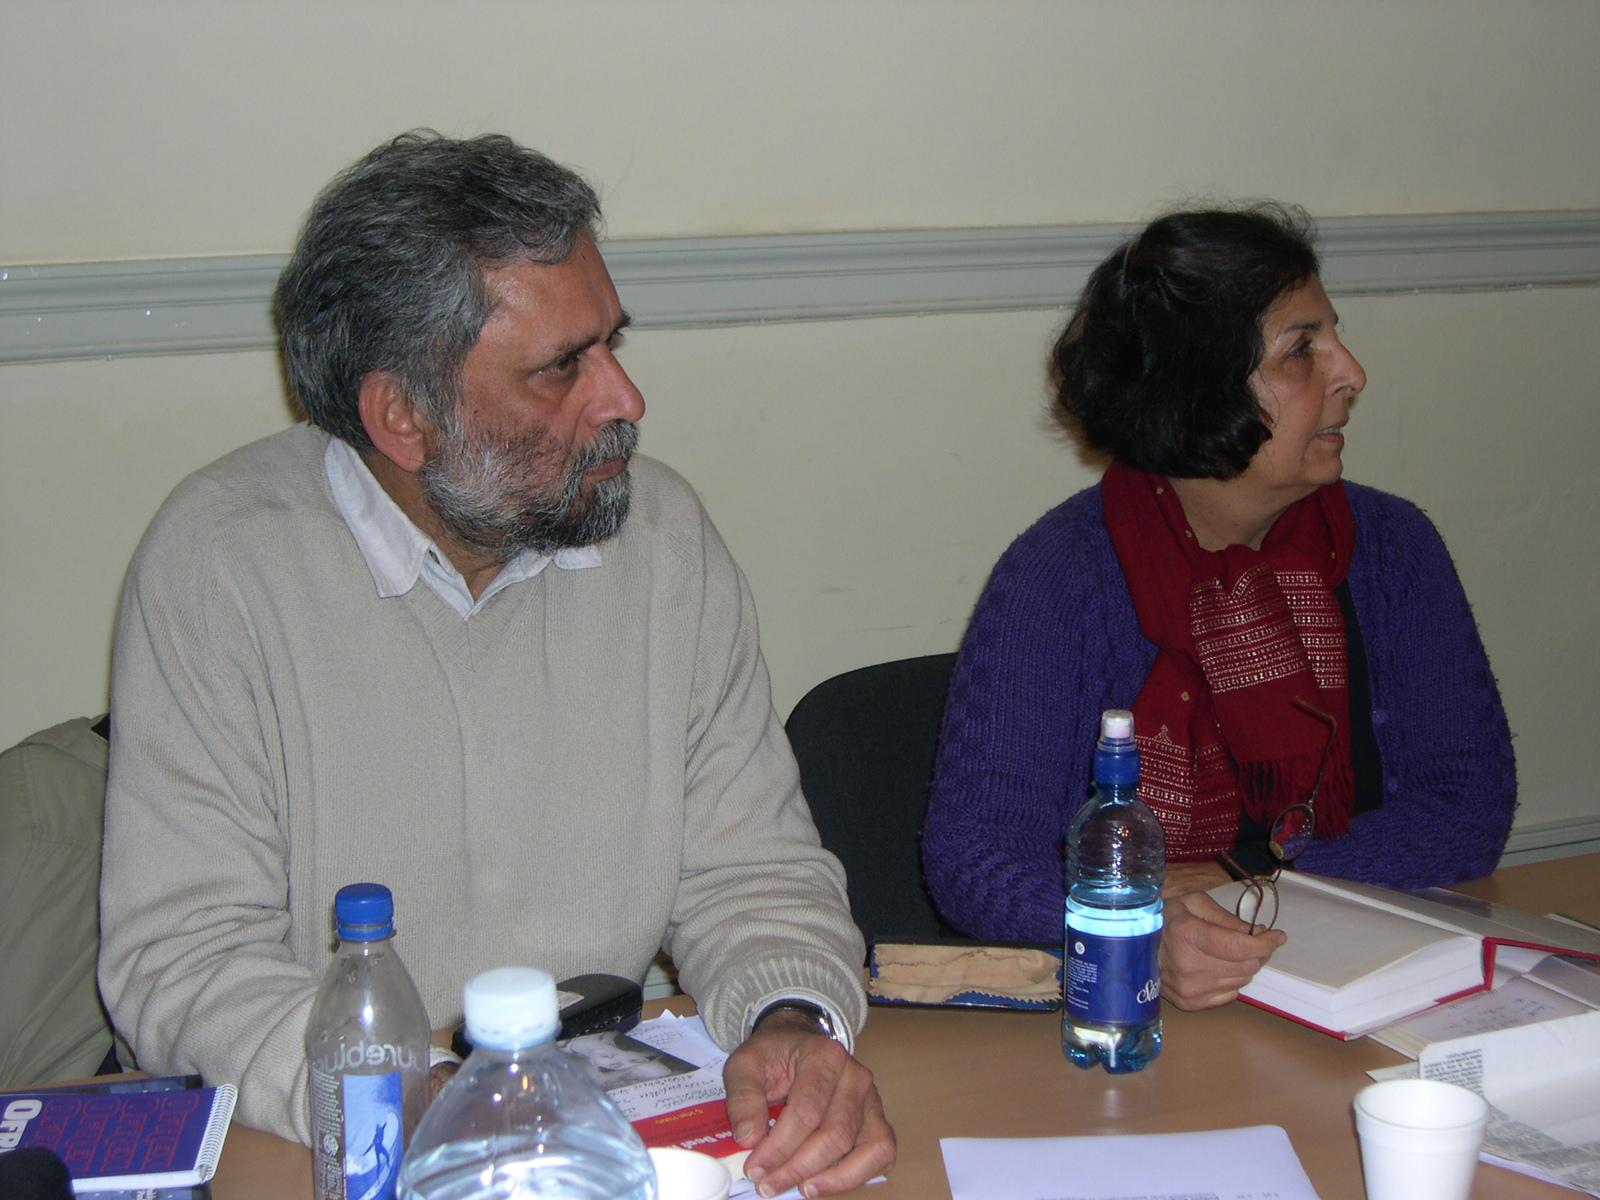 Pritam Singh and Pratima Mitchell